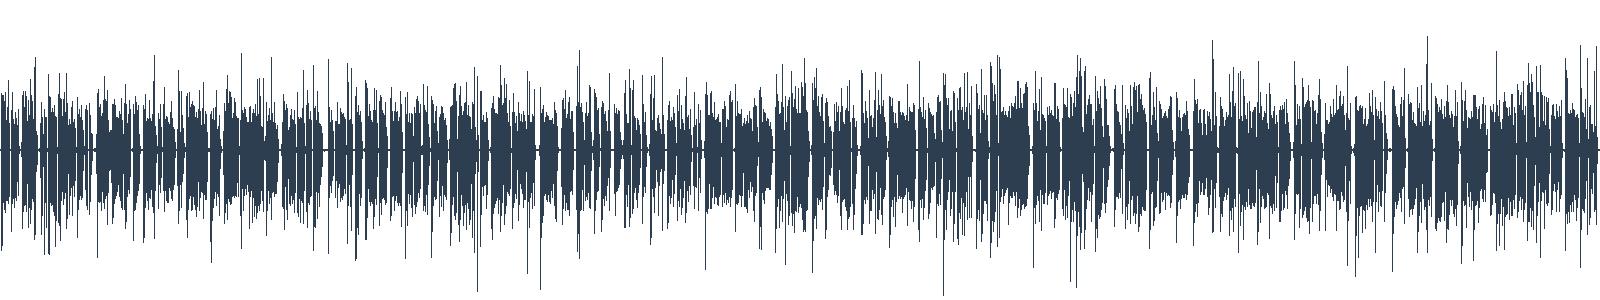 Jonathan Strange & pán Norrell waveform